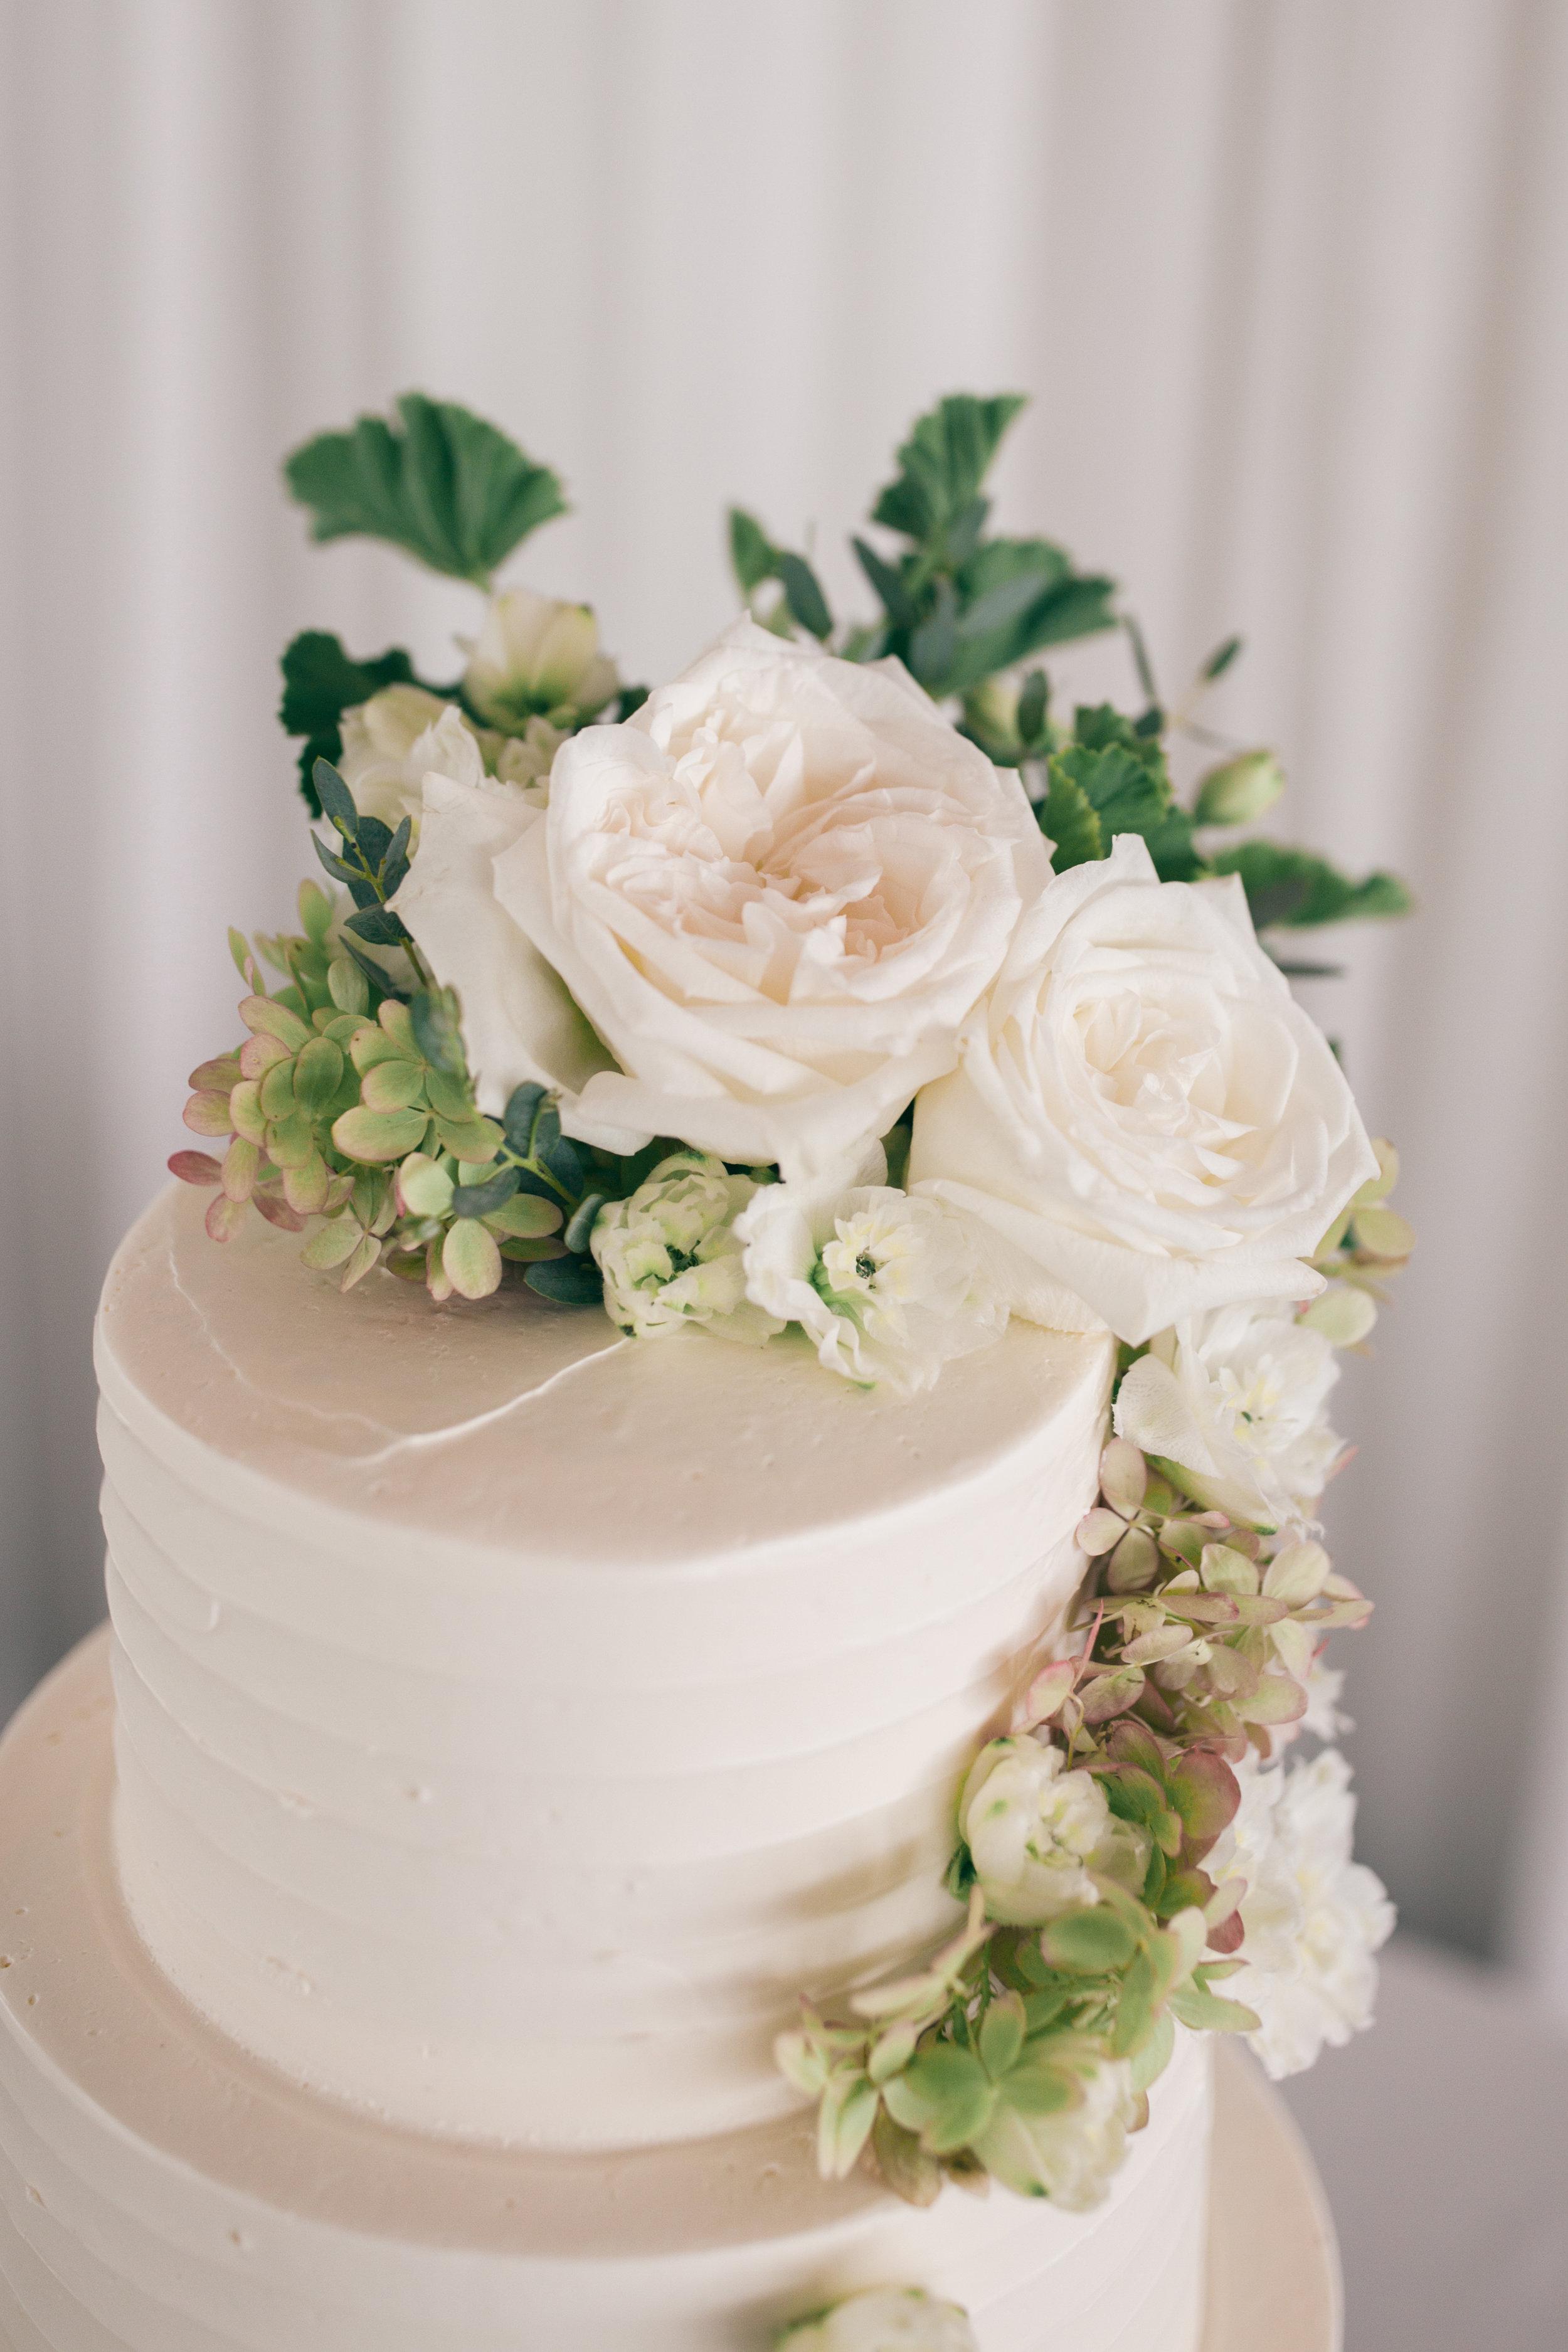 Geranium and Roses cake, Belle Mer